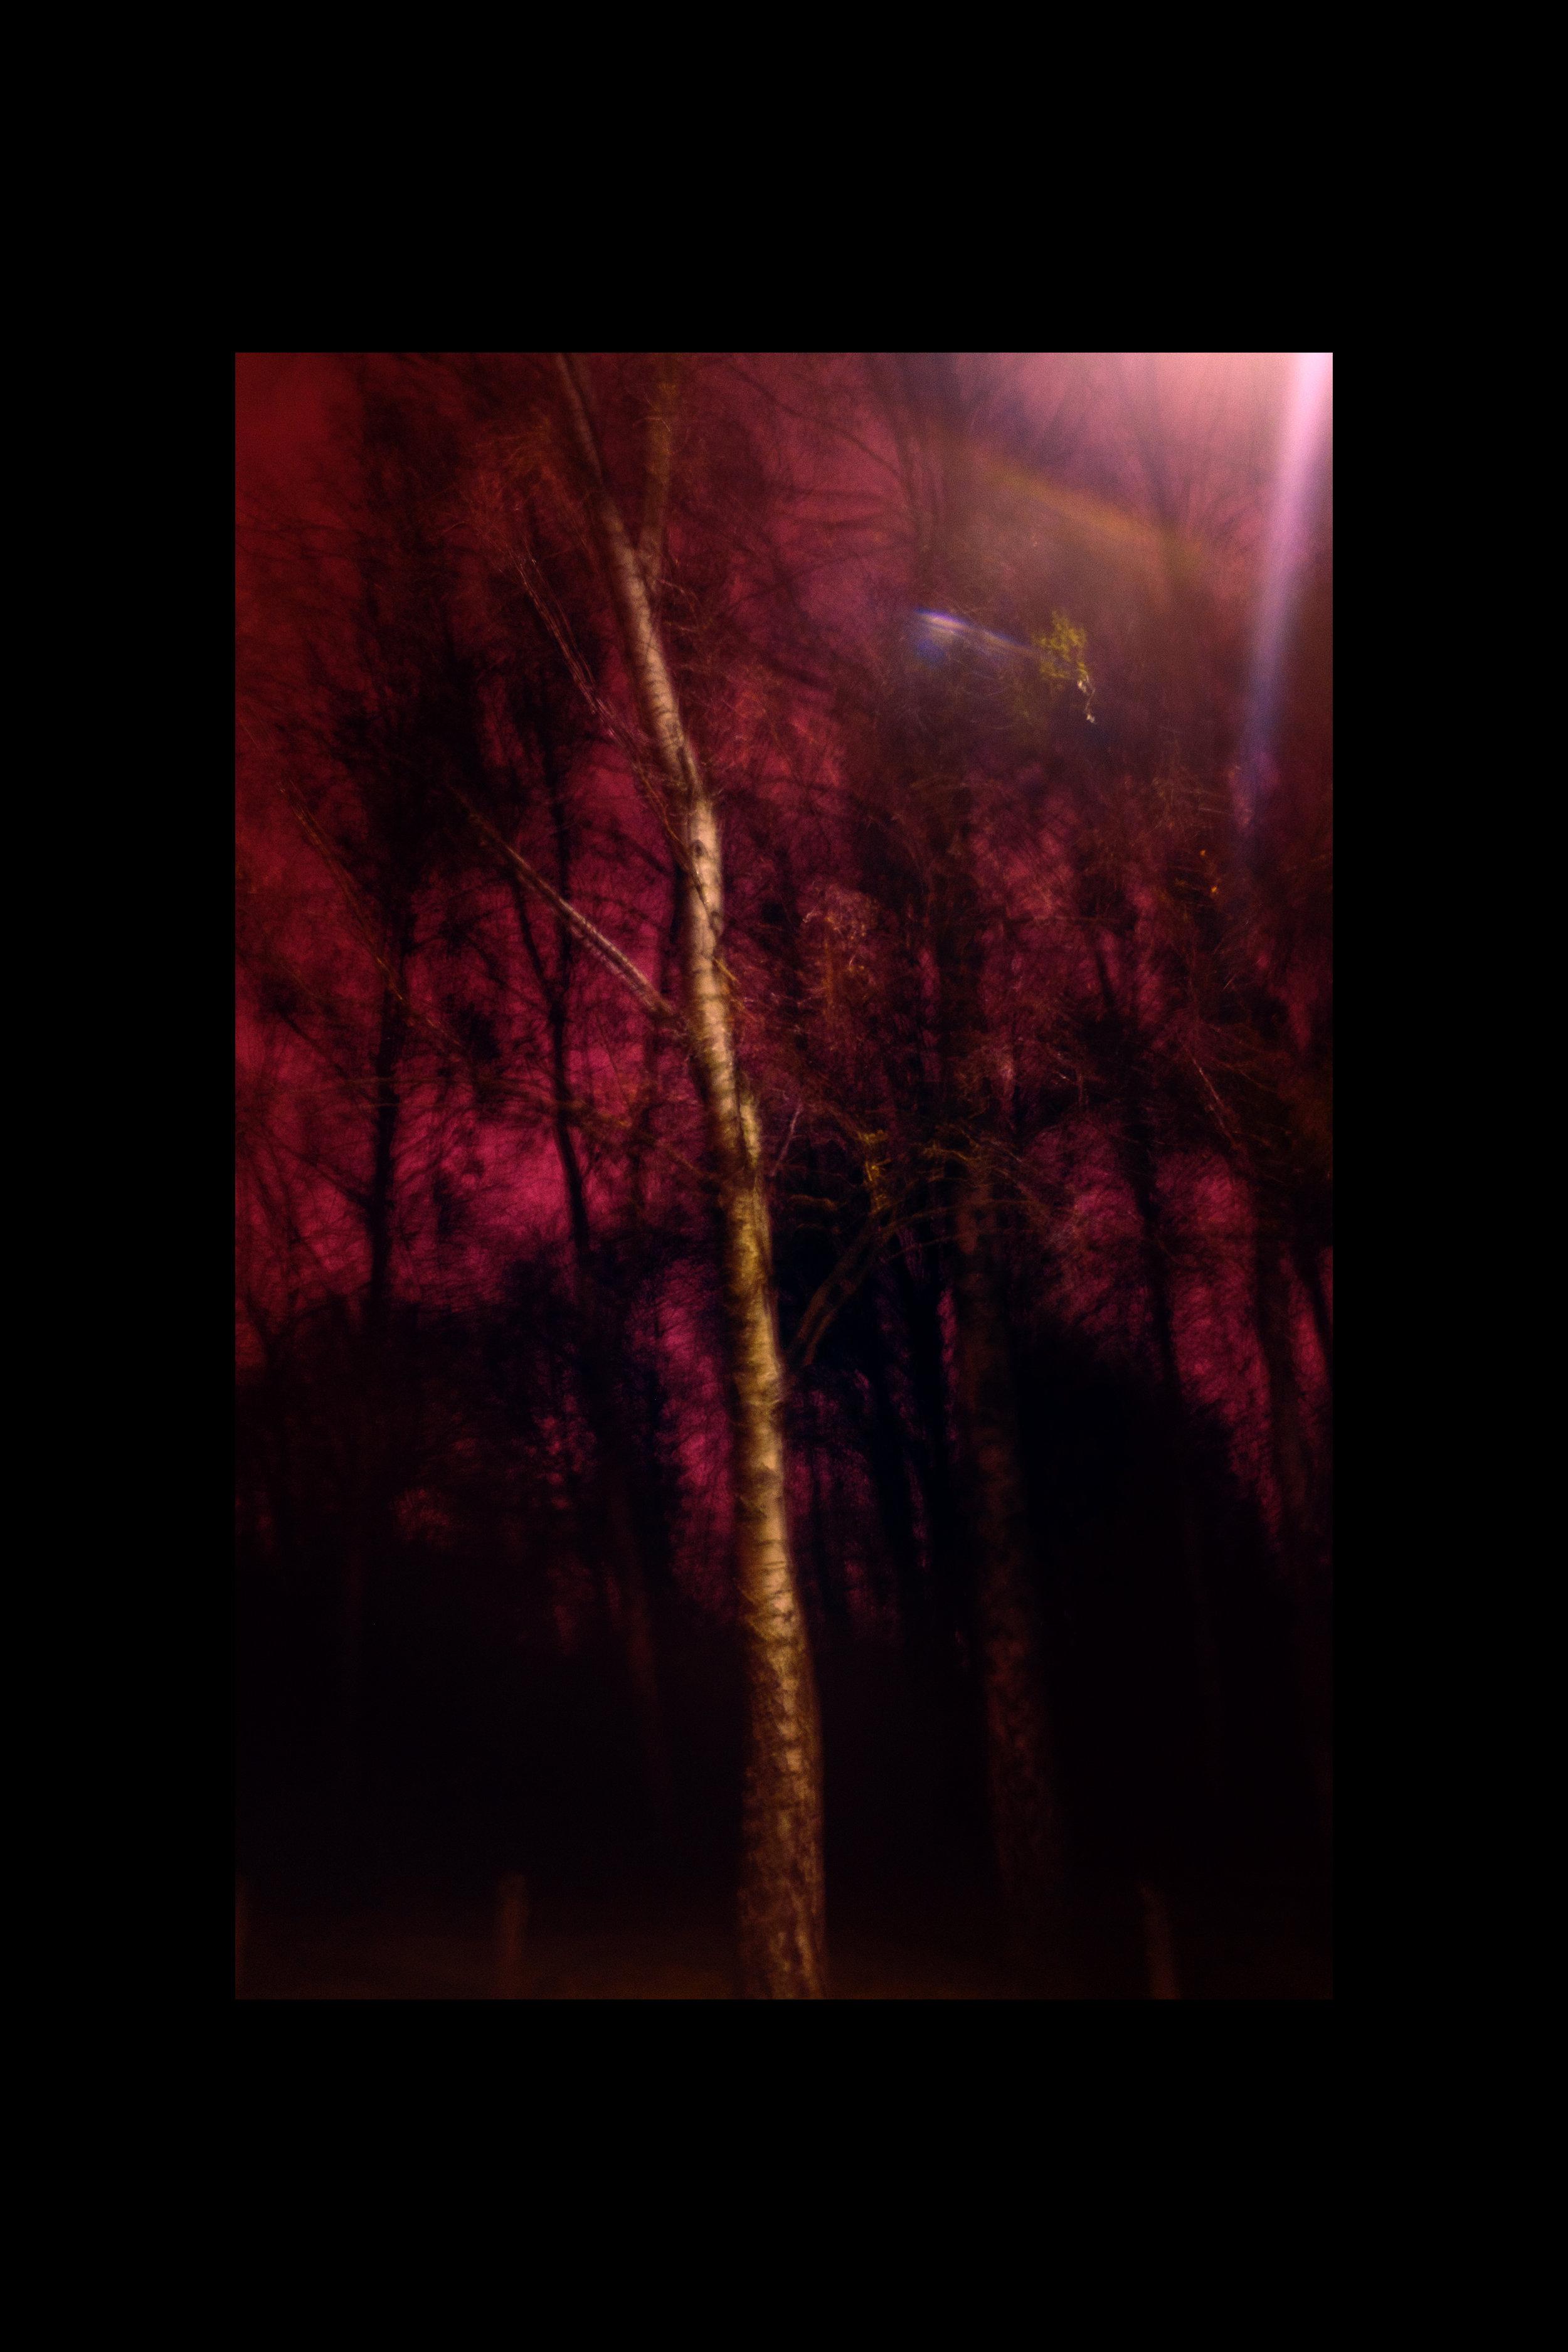 Baum_rot_2_web.jpg